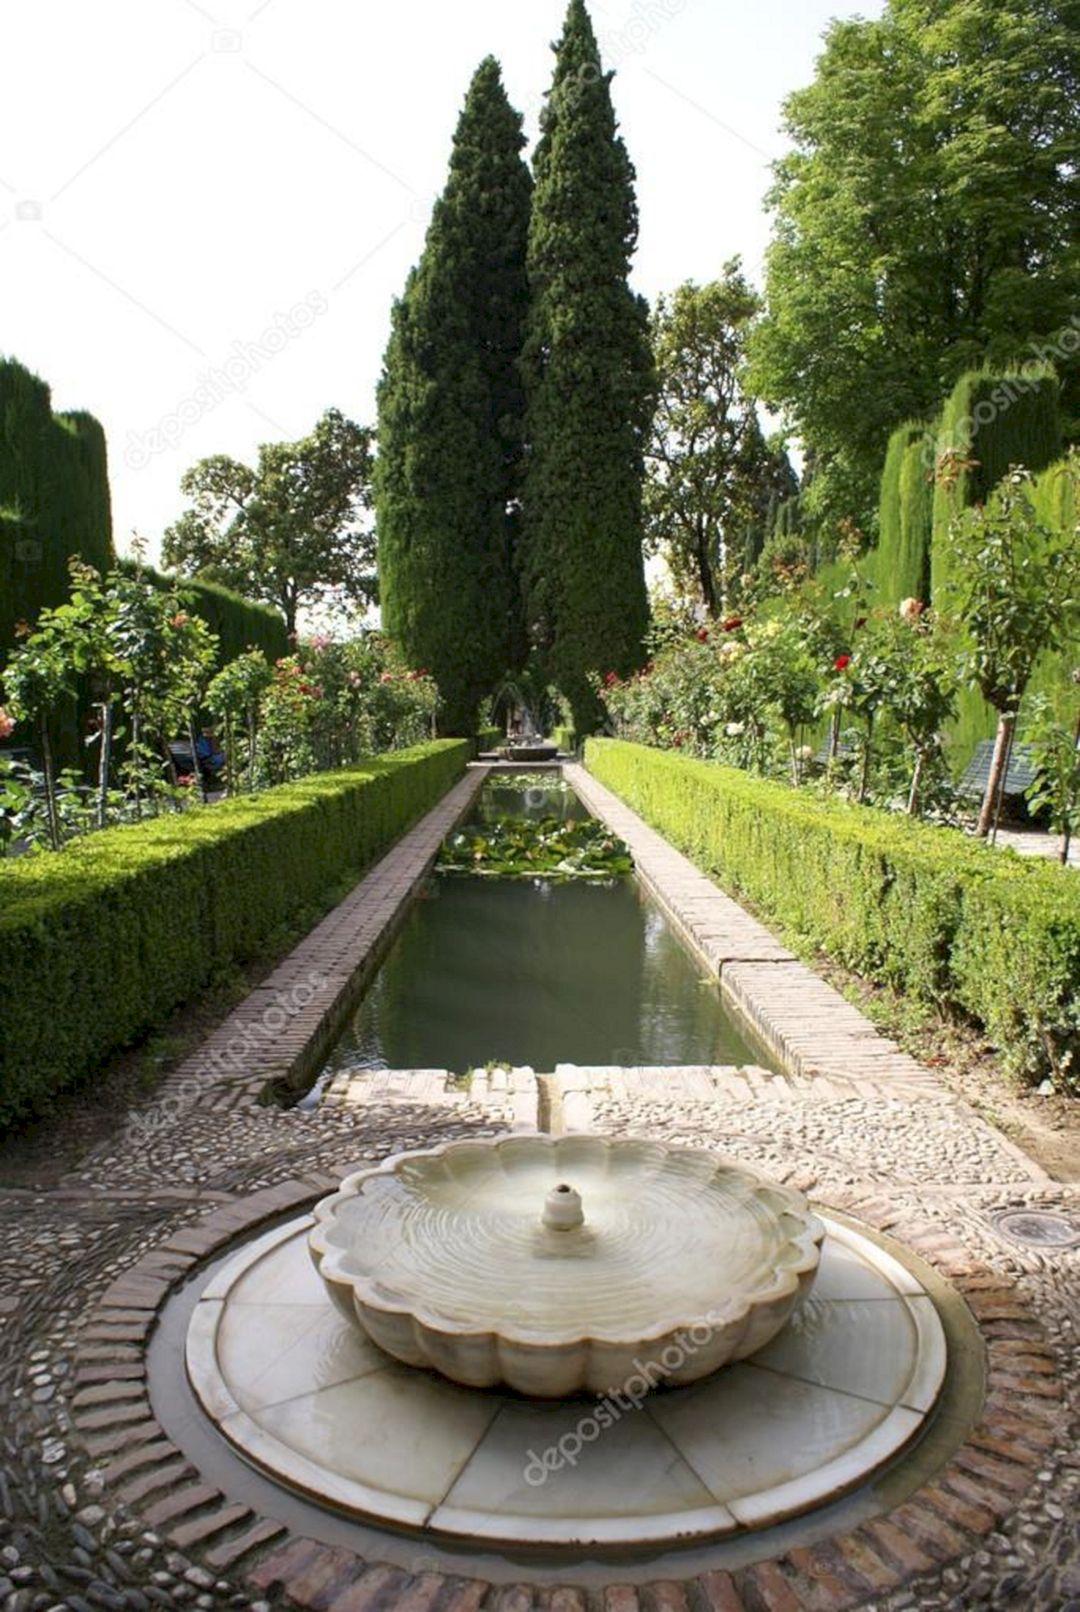 Garden Fountain Designs (Garden Fountain Designs) design ... on Home Garden Fountain Design id=77297